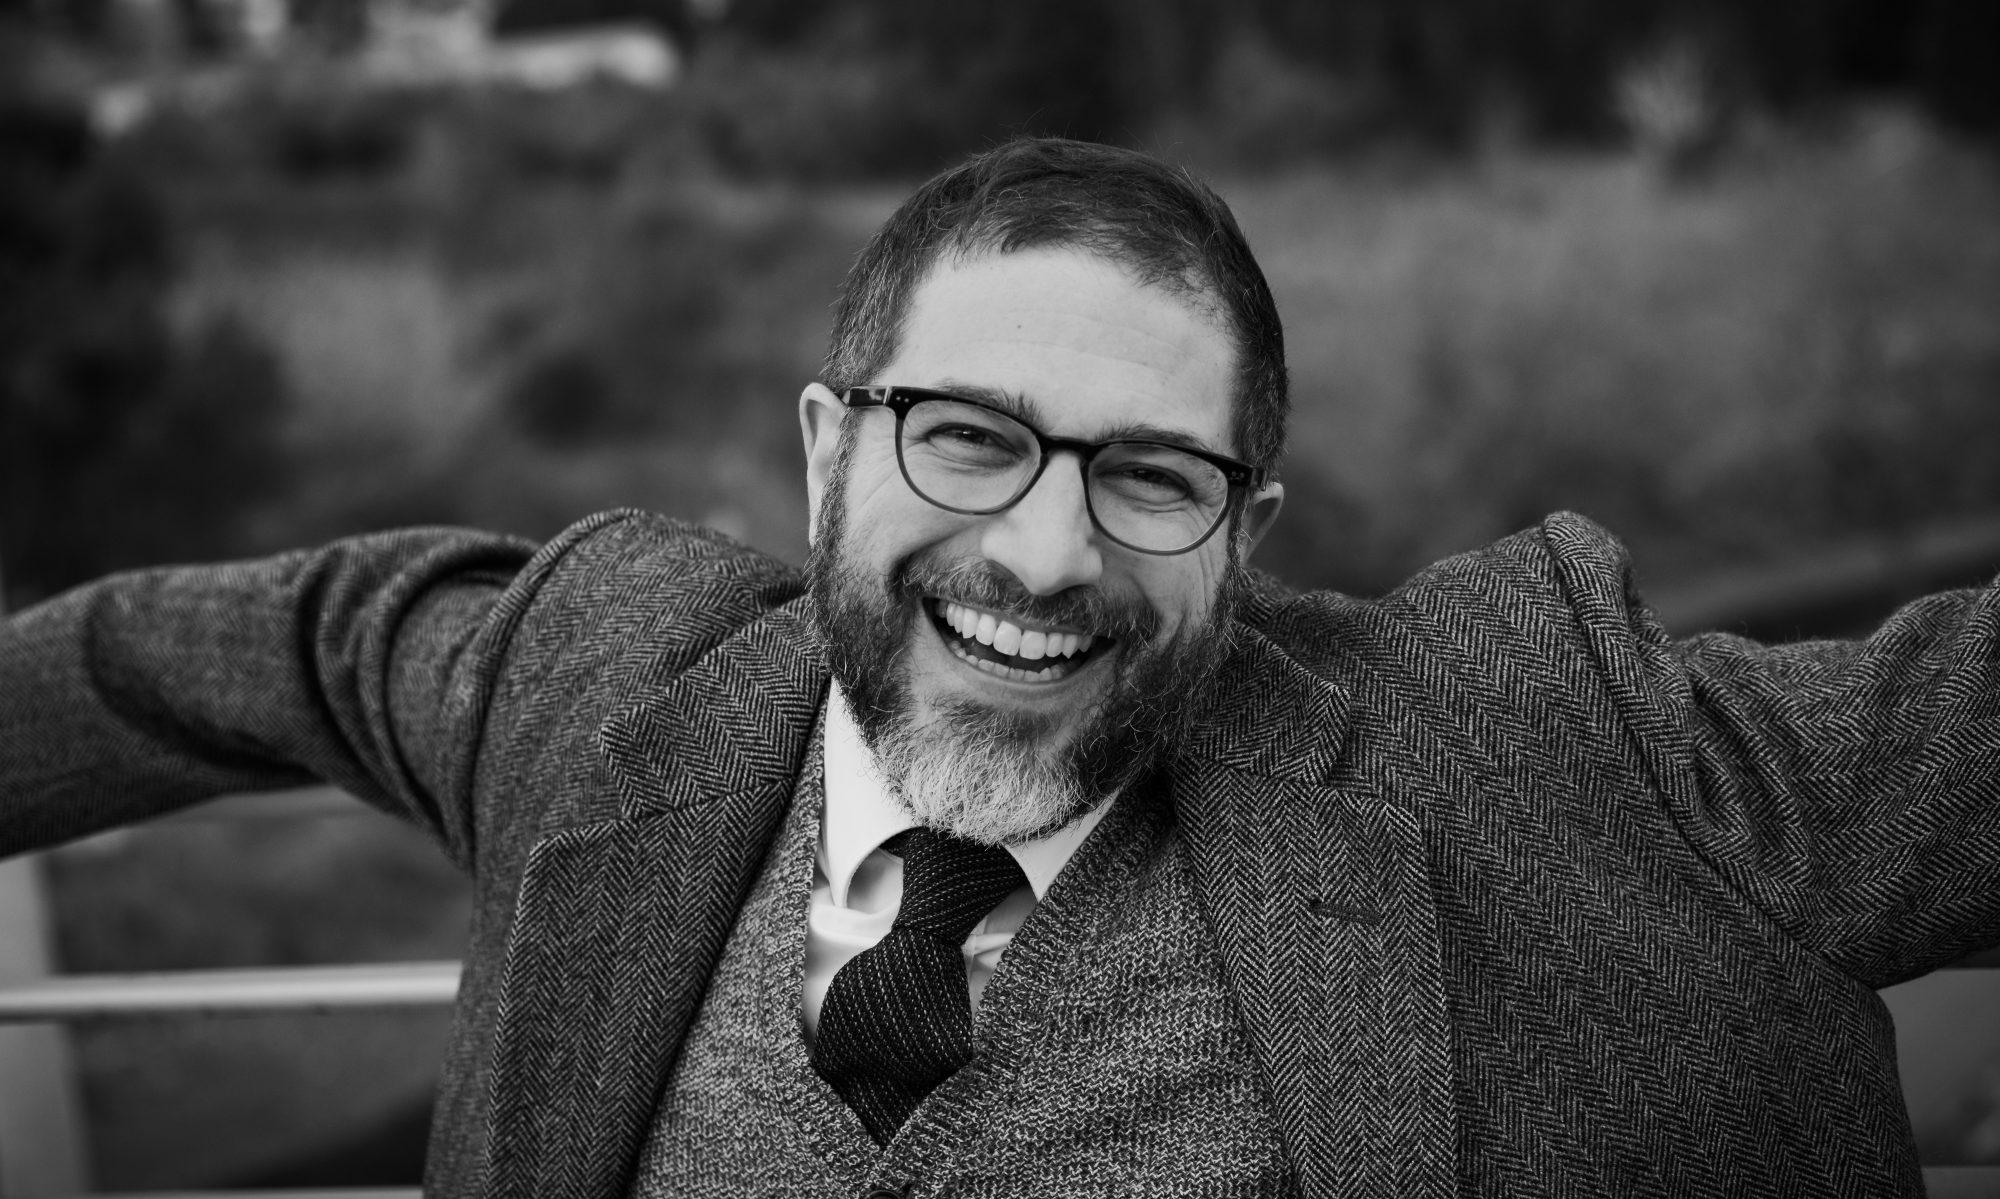 Shimshon Meir Frankel